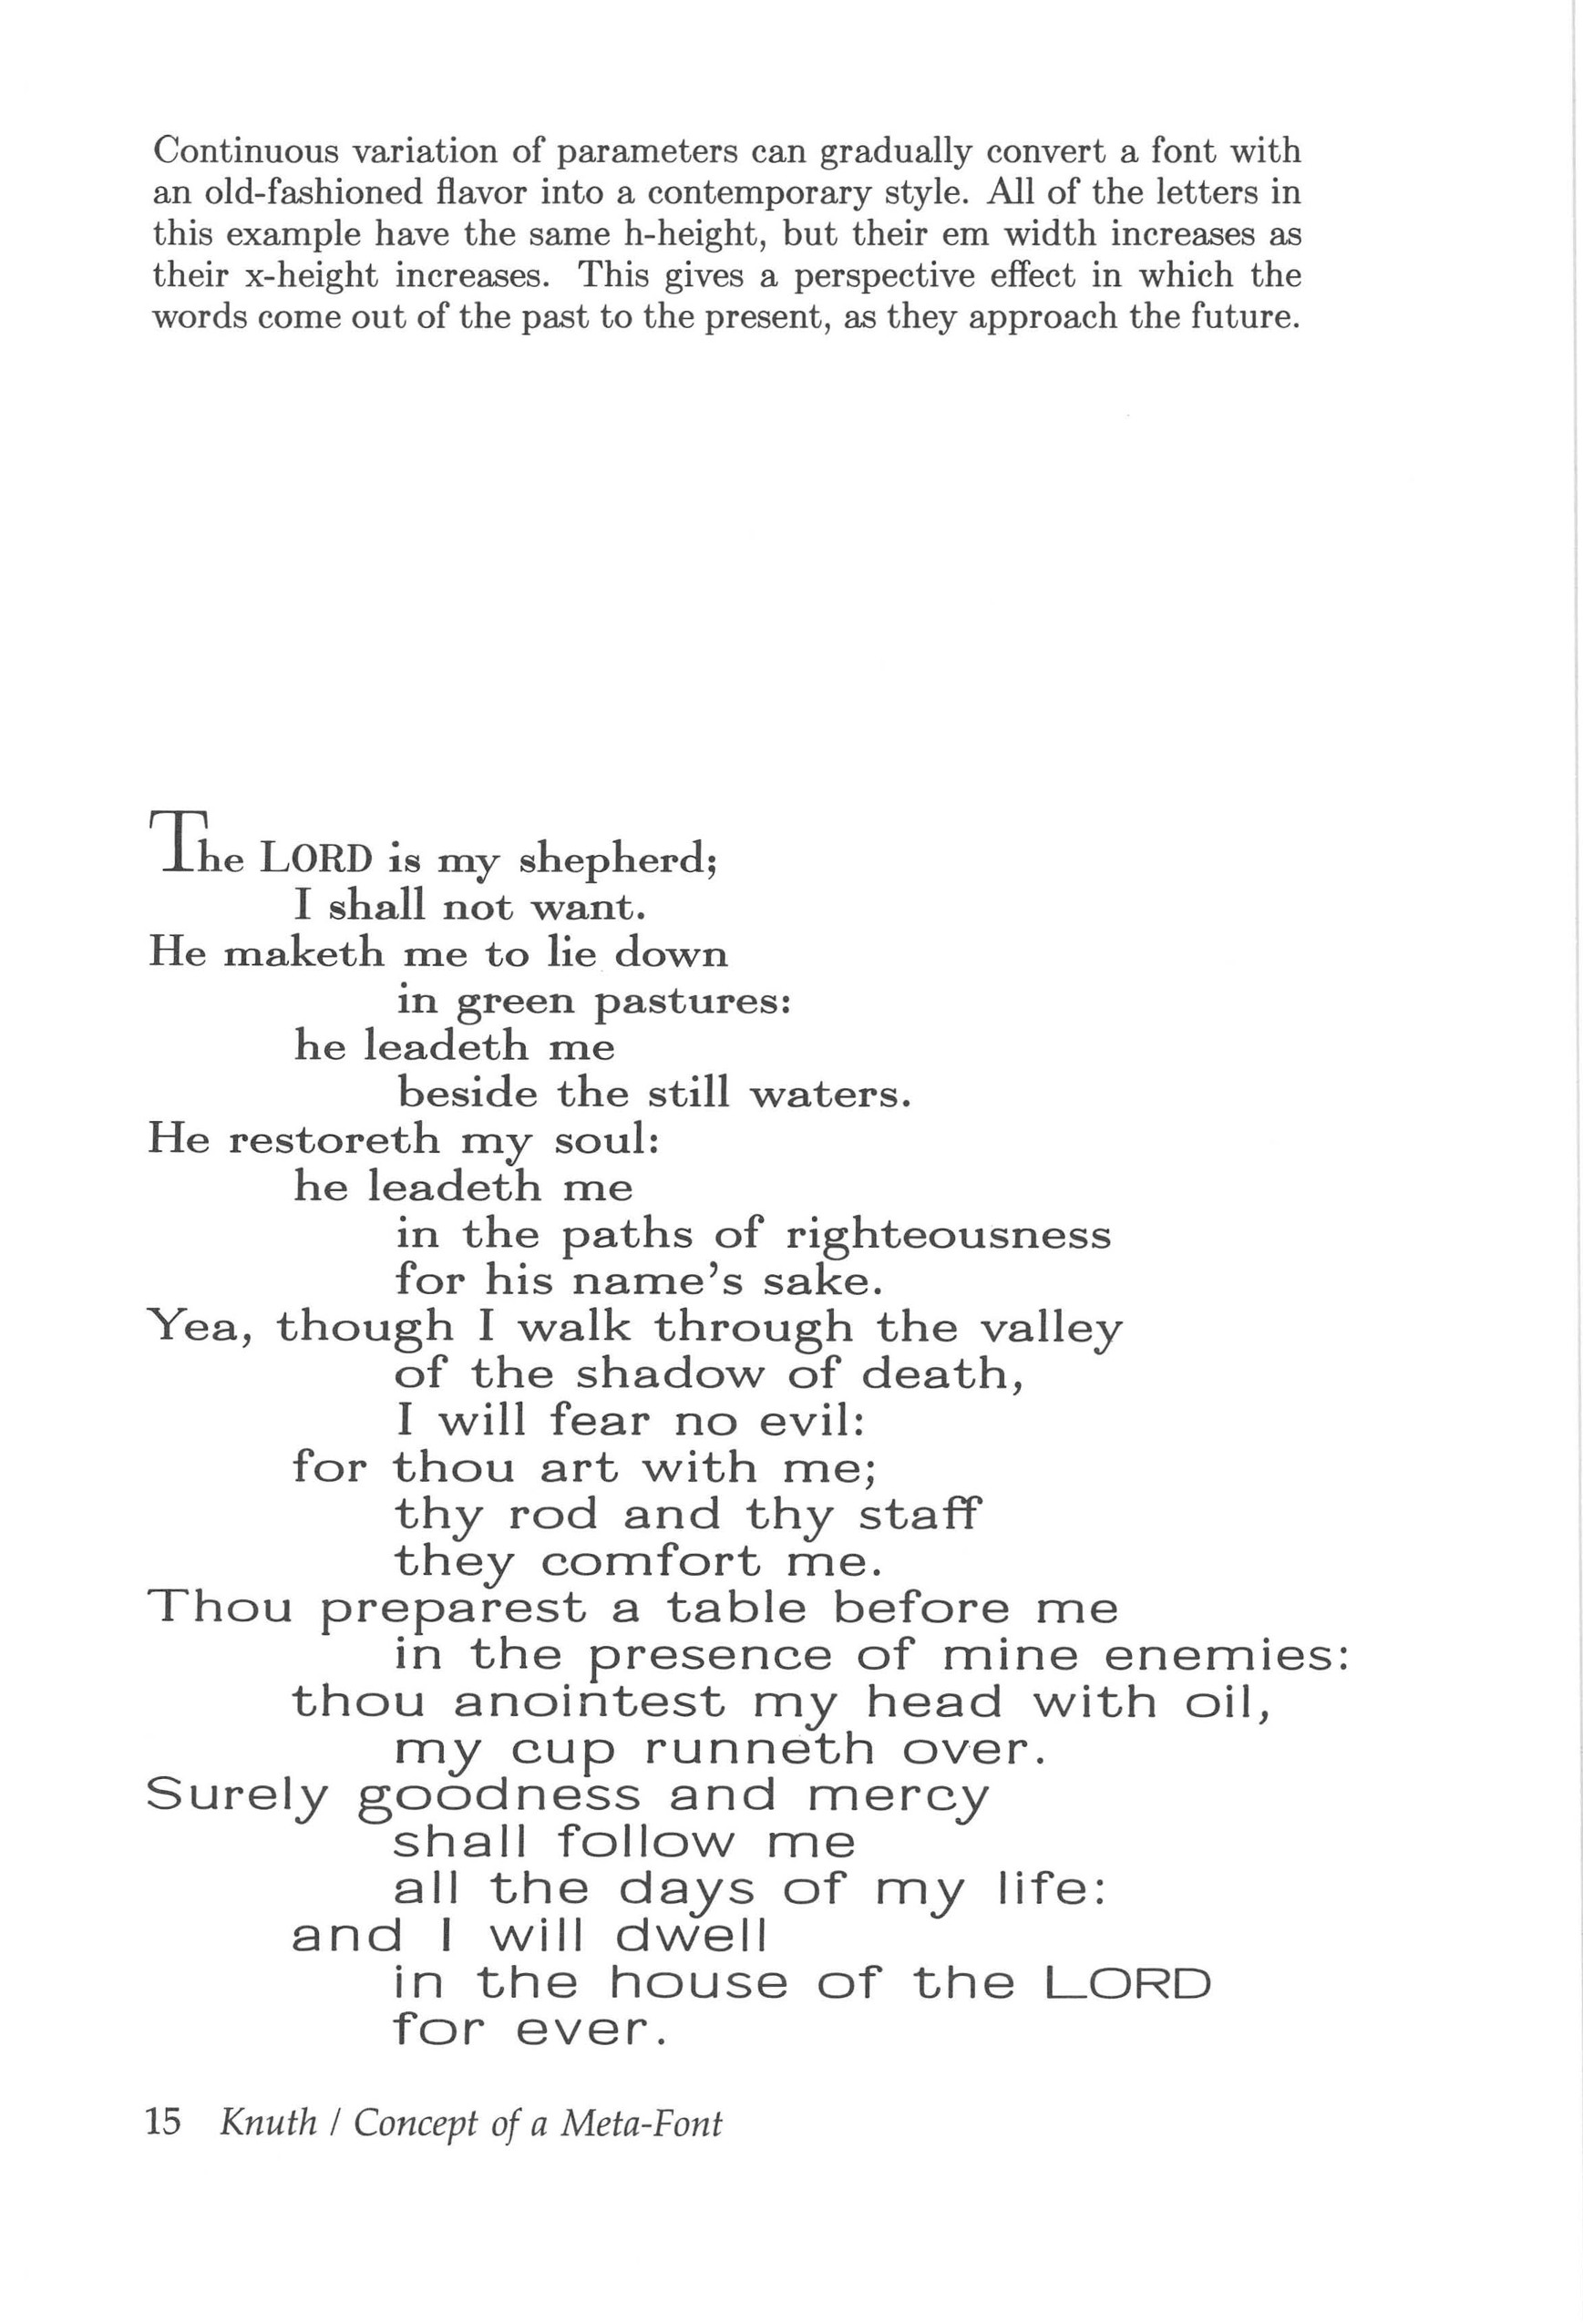 documentation/metafont-poem.jpg